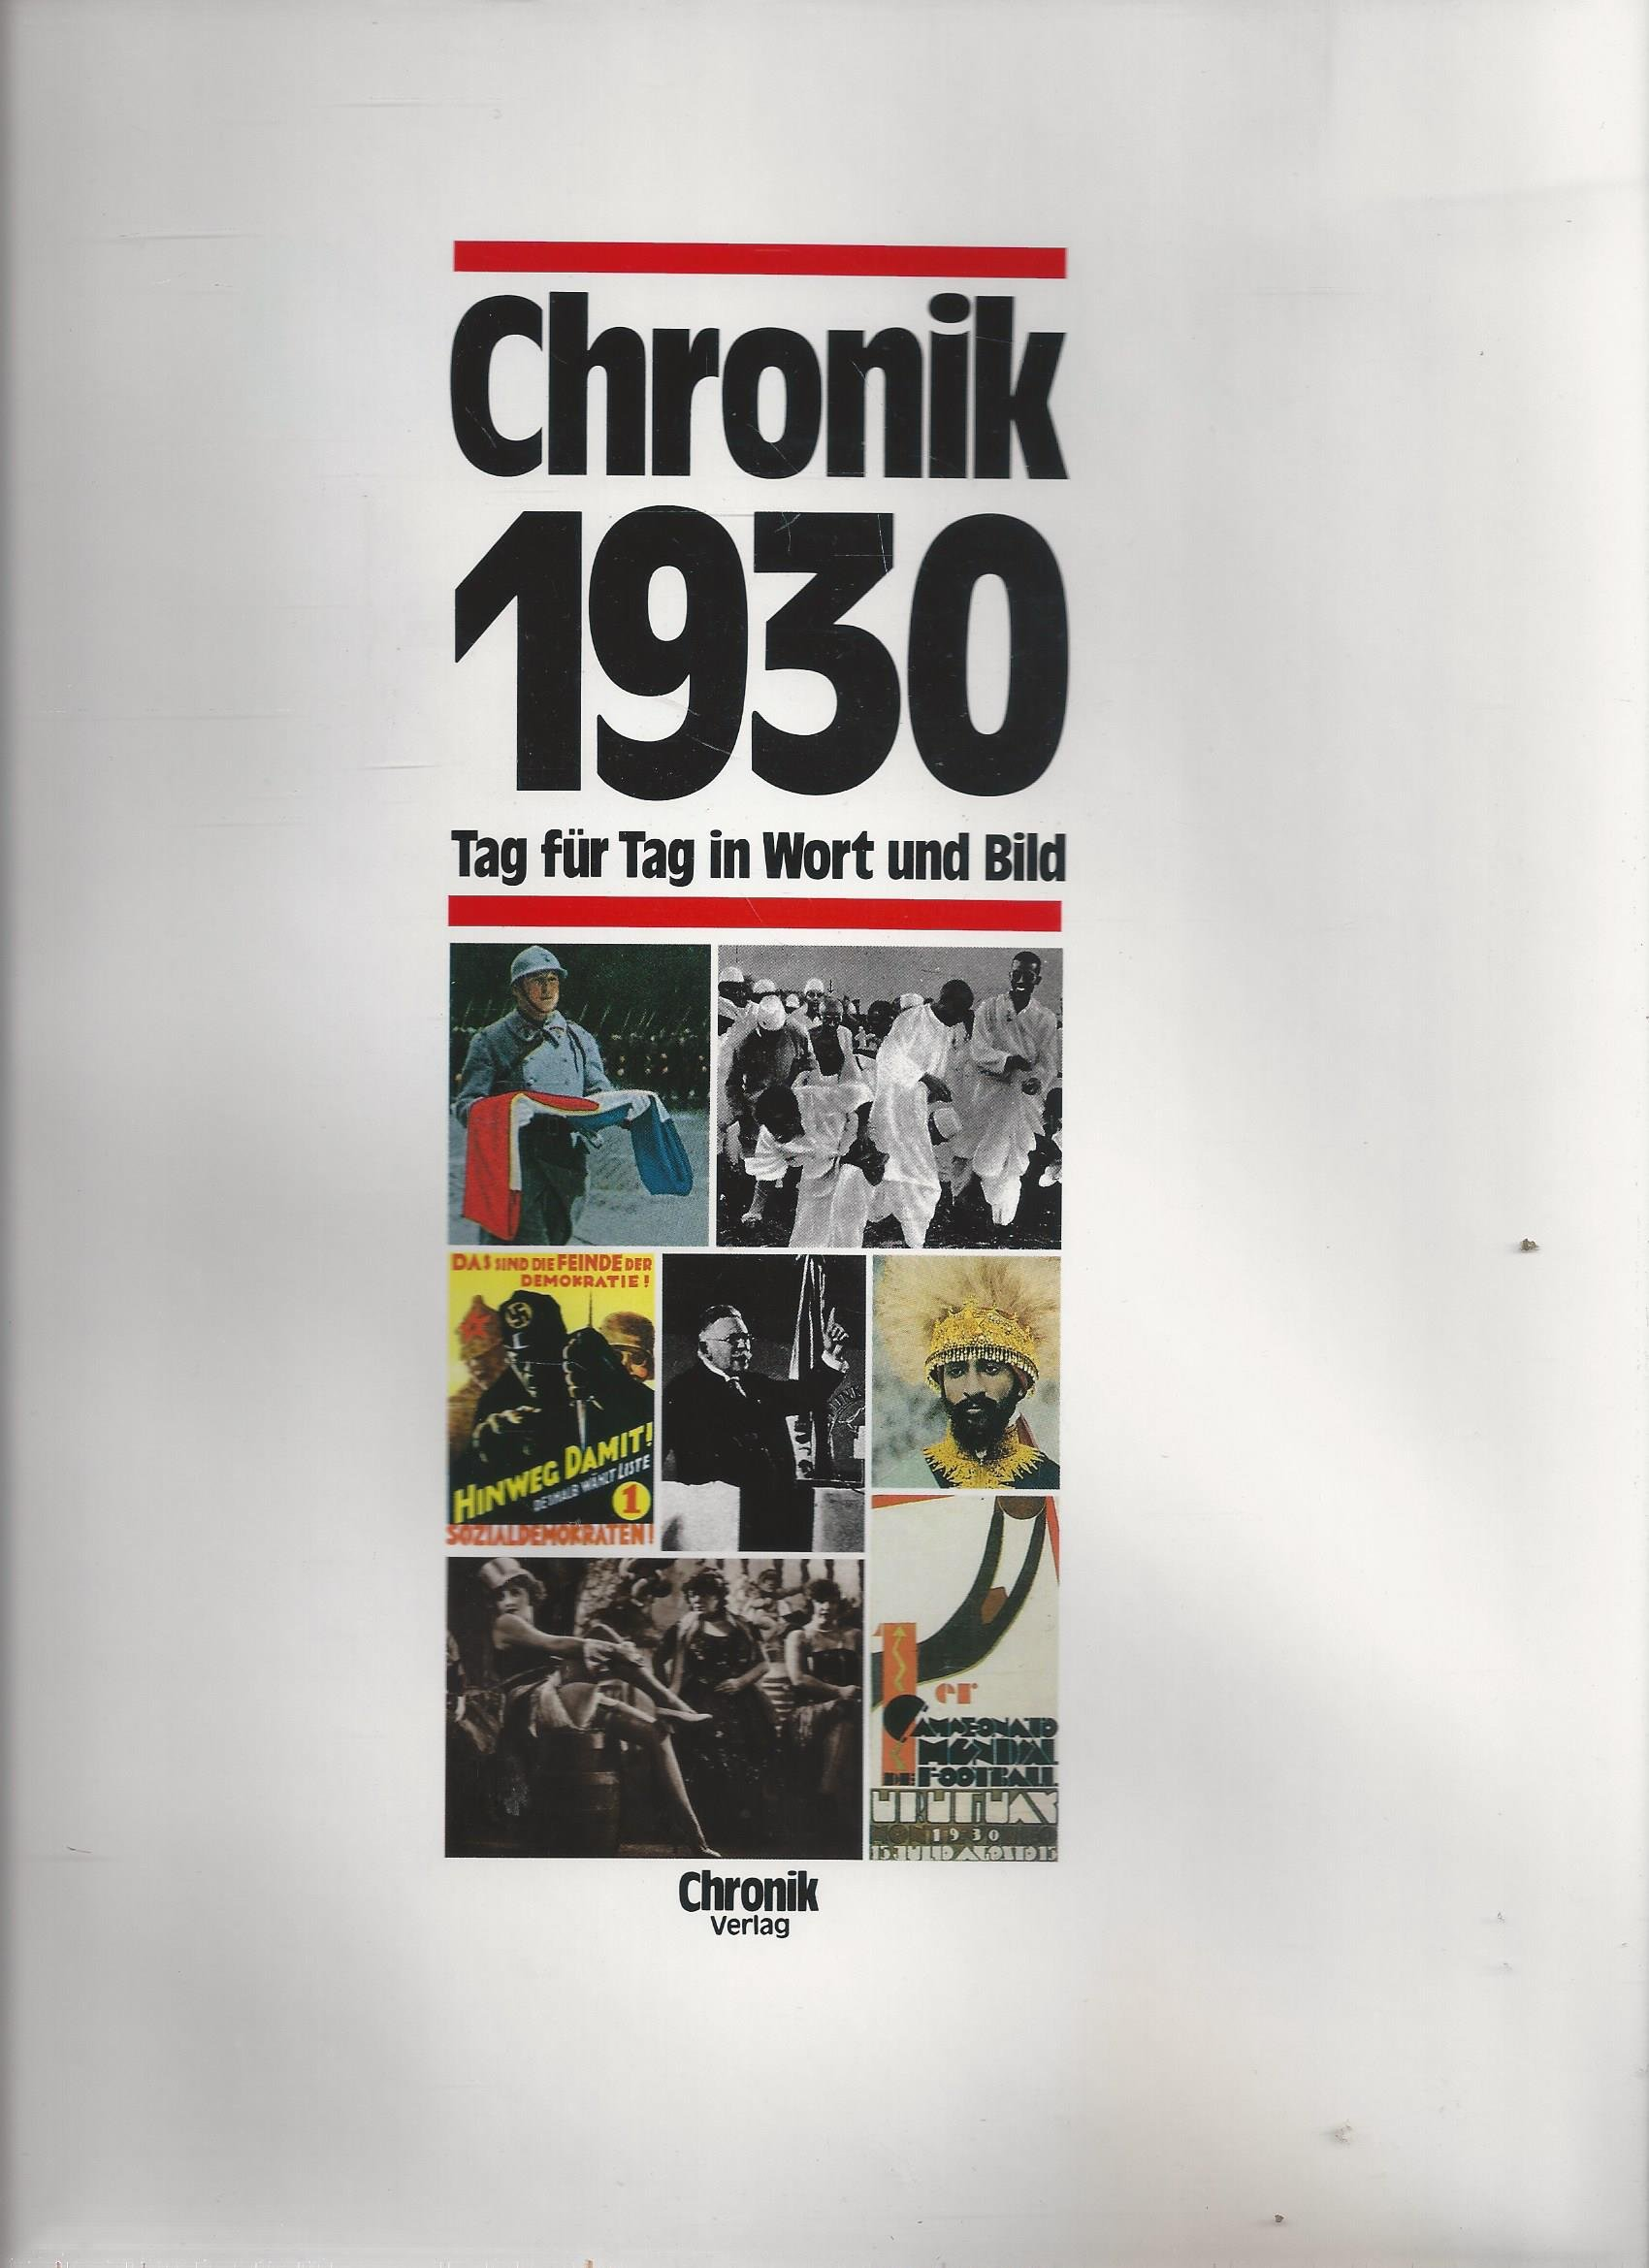 Chronik 1930 - Jahrgangsbuch-Chronik 1930 - Jahrgangsbuch 1930